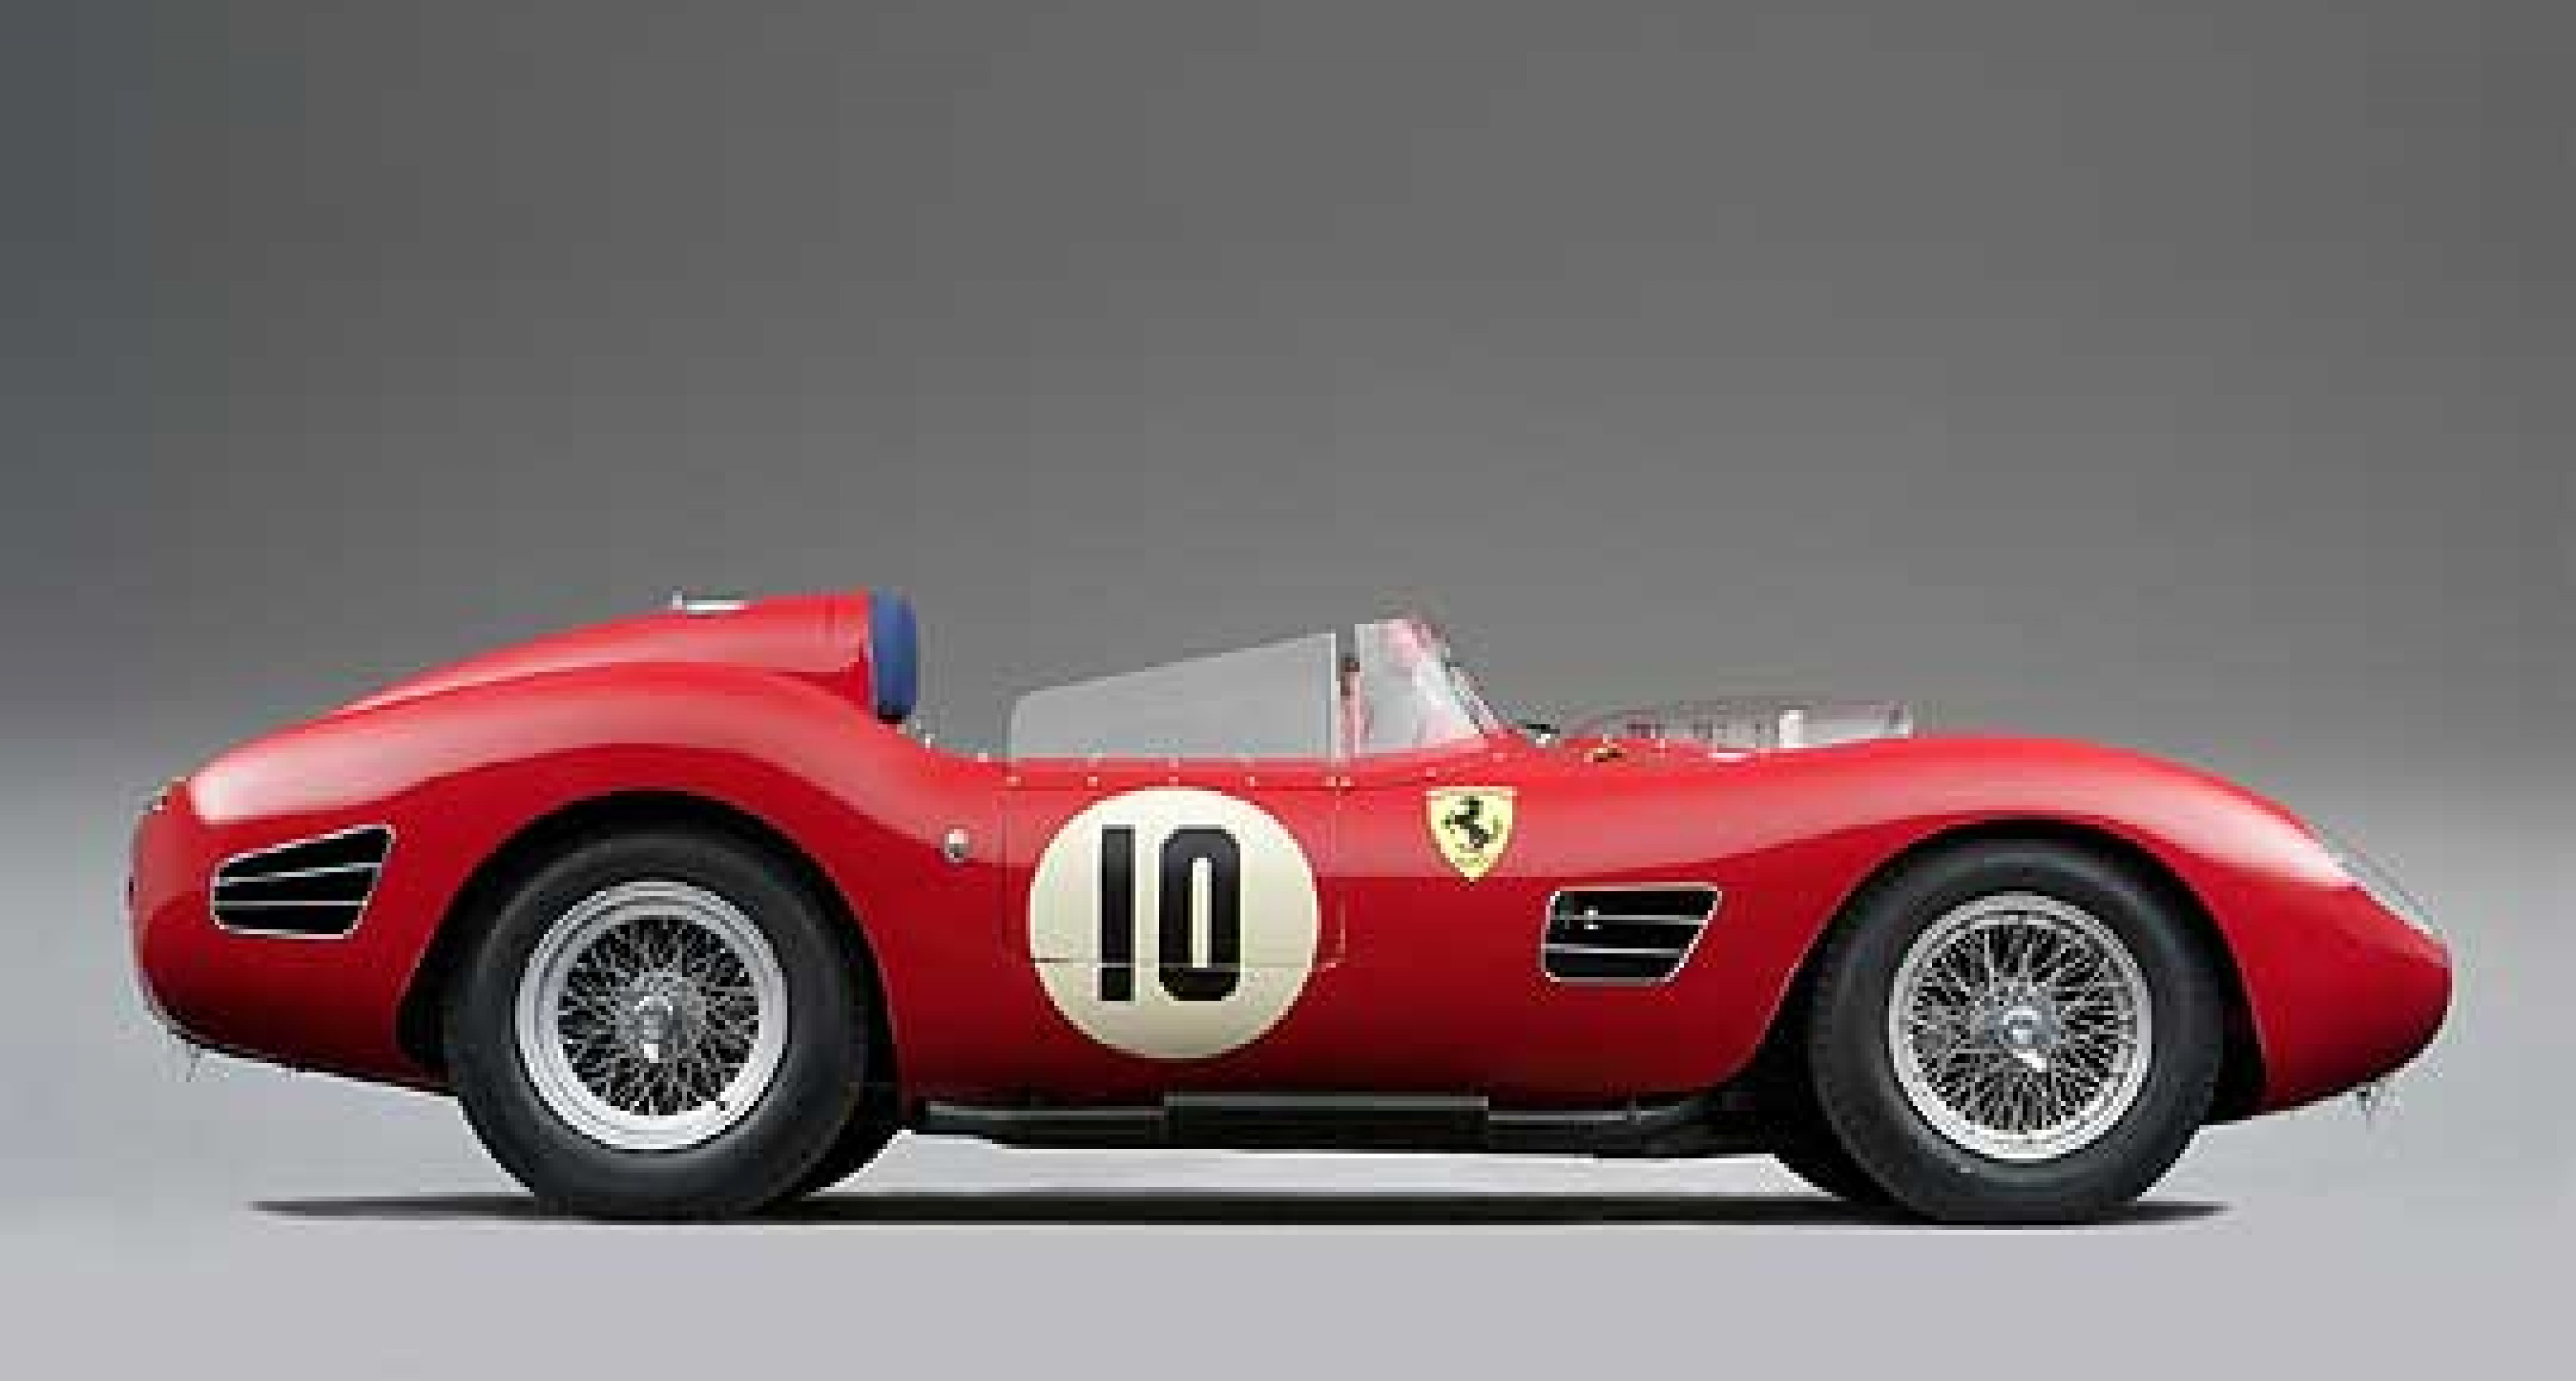 The 2008 Ferrari Auction at Maranello